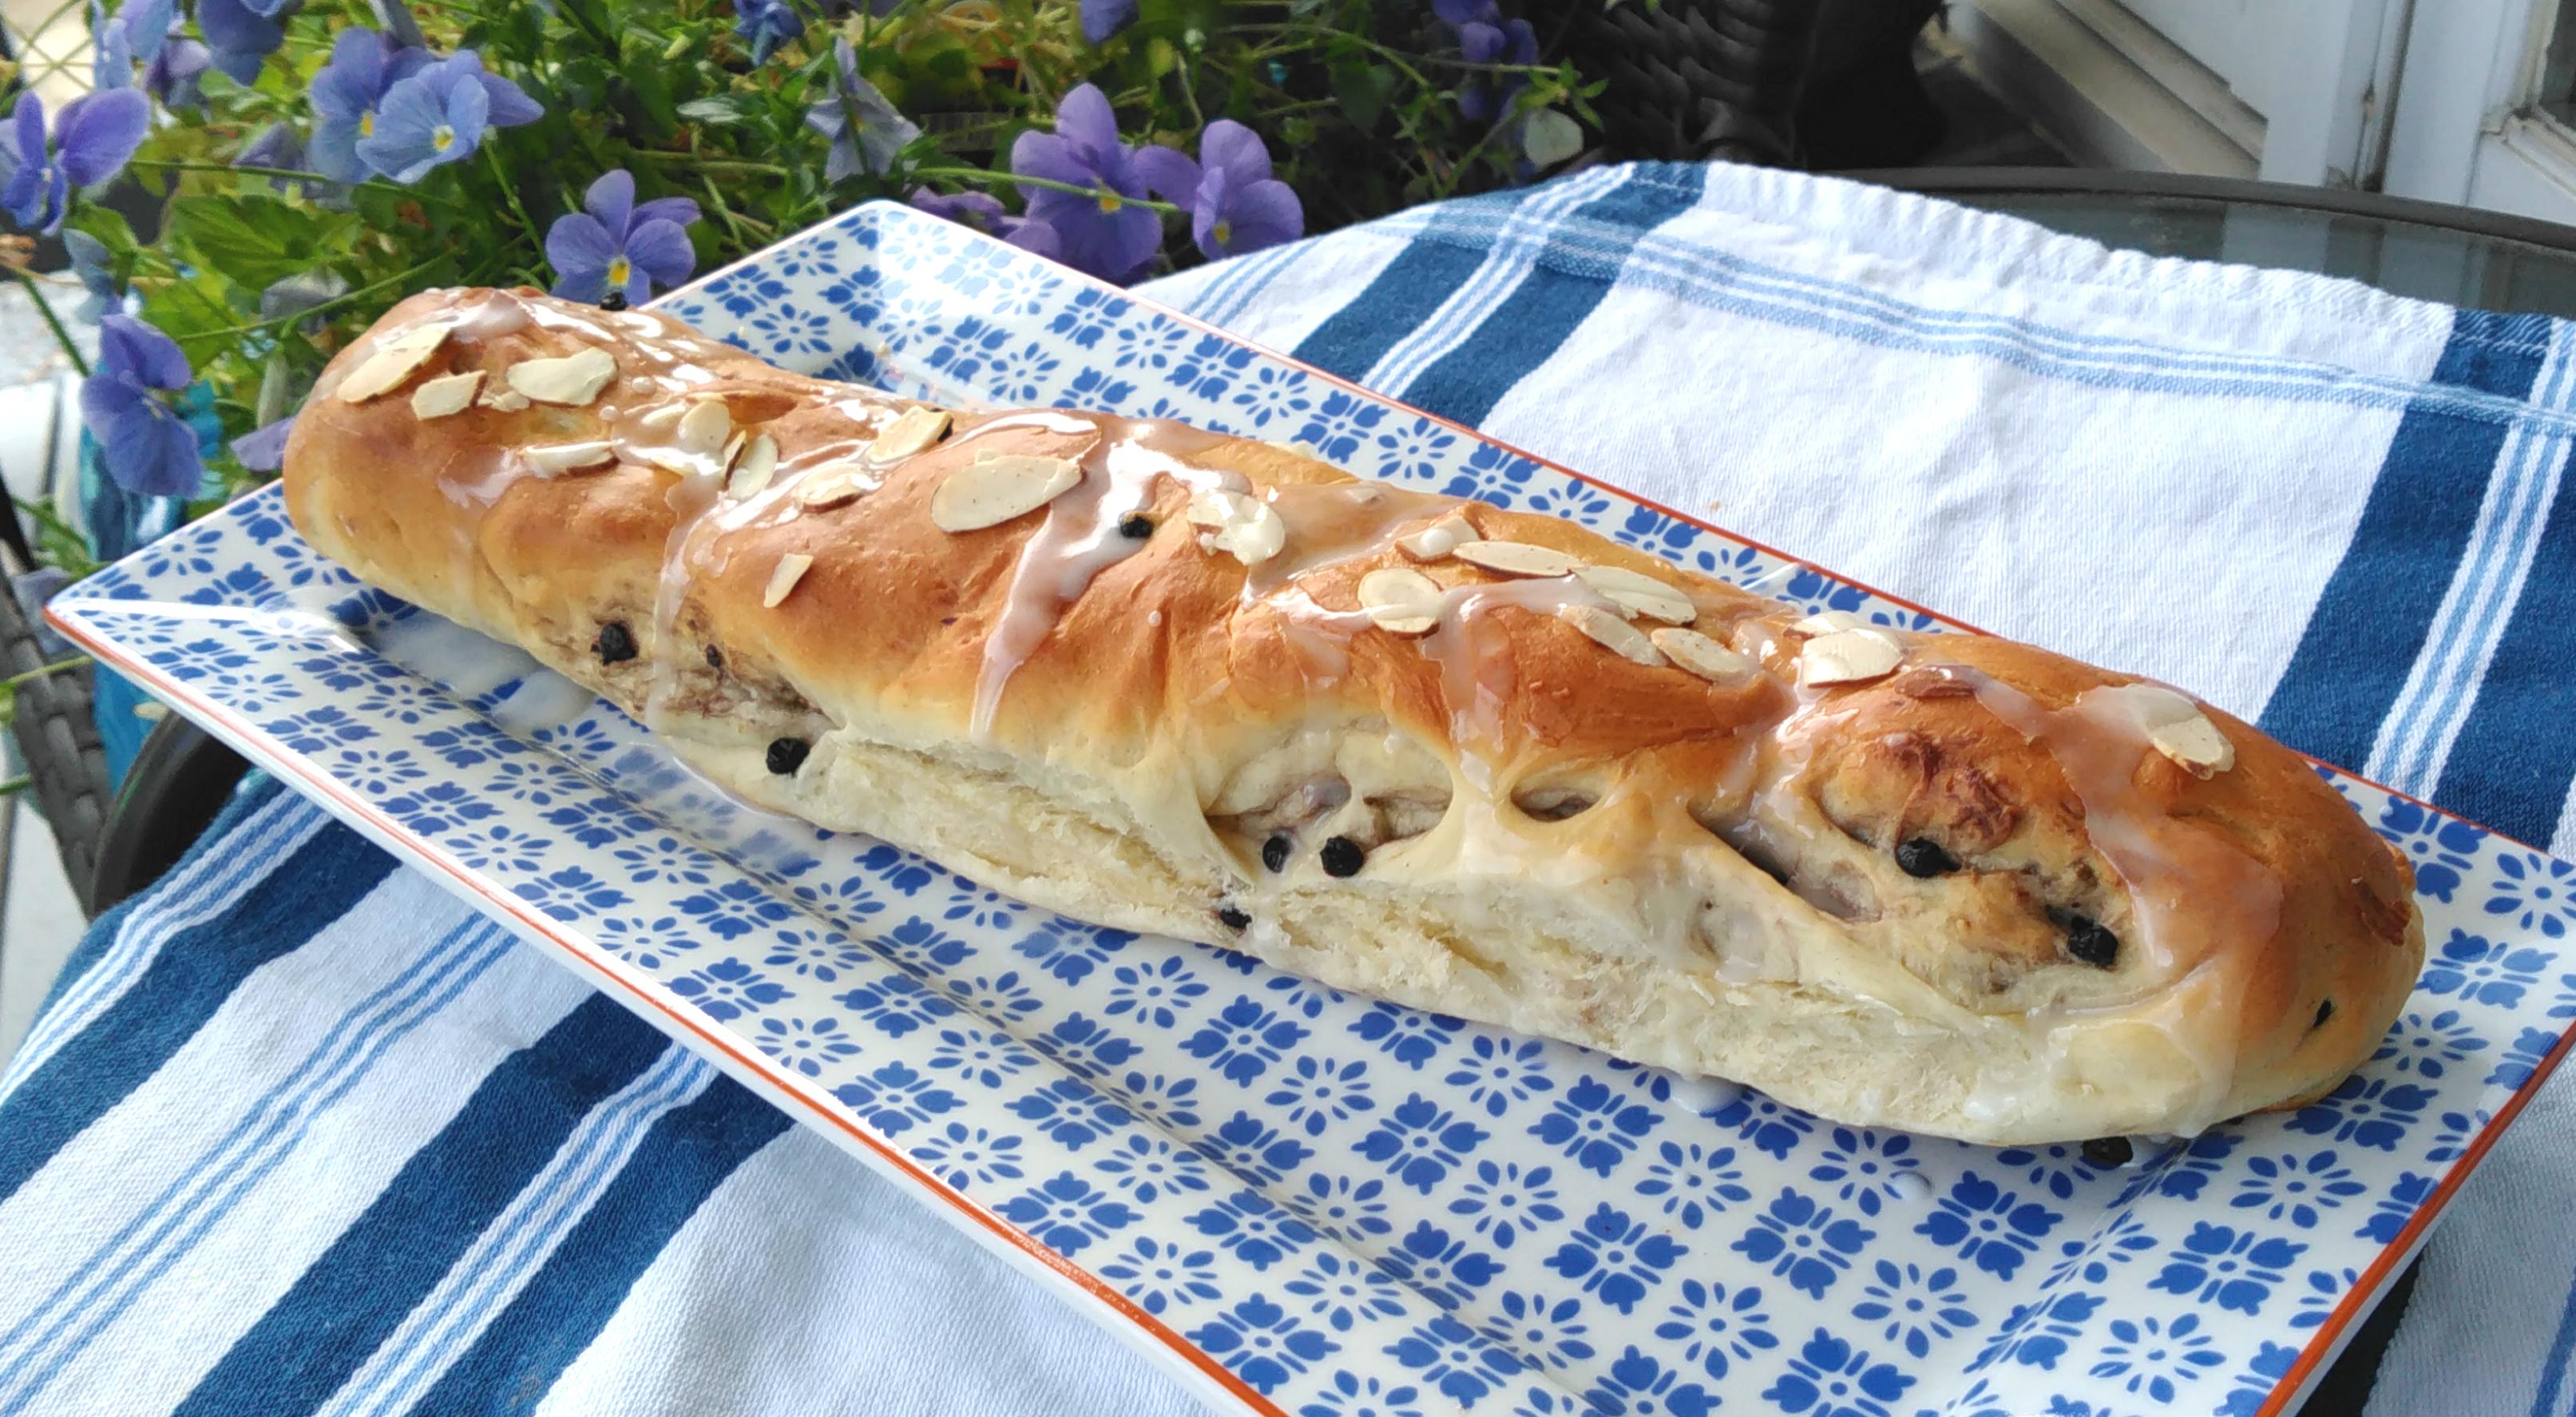 Lemon-Blueberry Yeast Bread